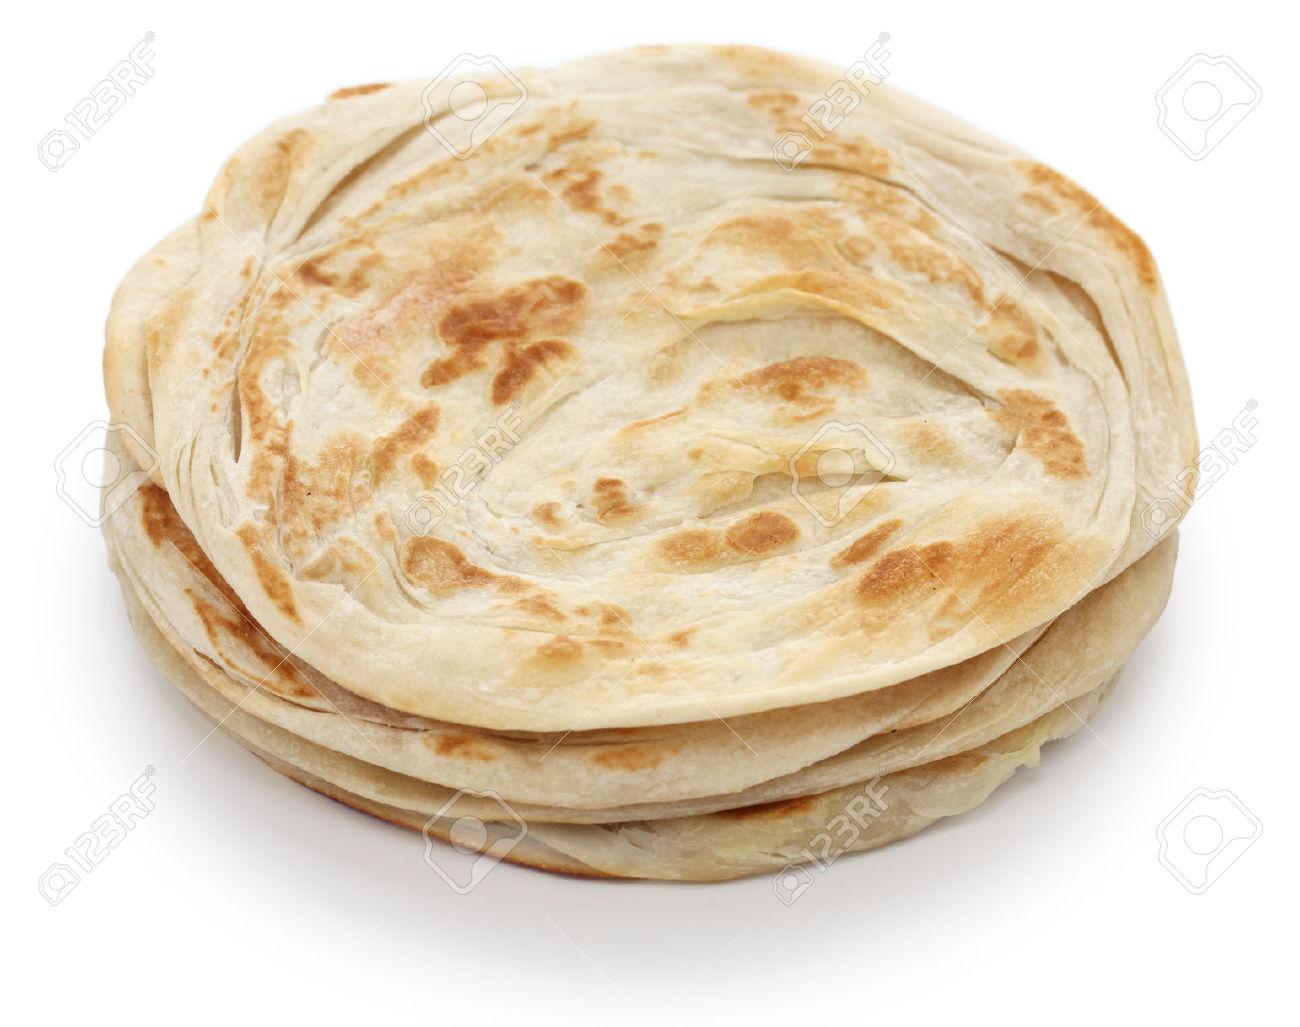 Plain Paratha, Multi Layered Indian Flat Bread Stock Photo.